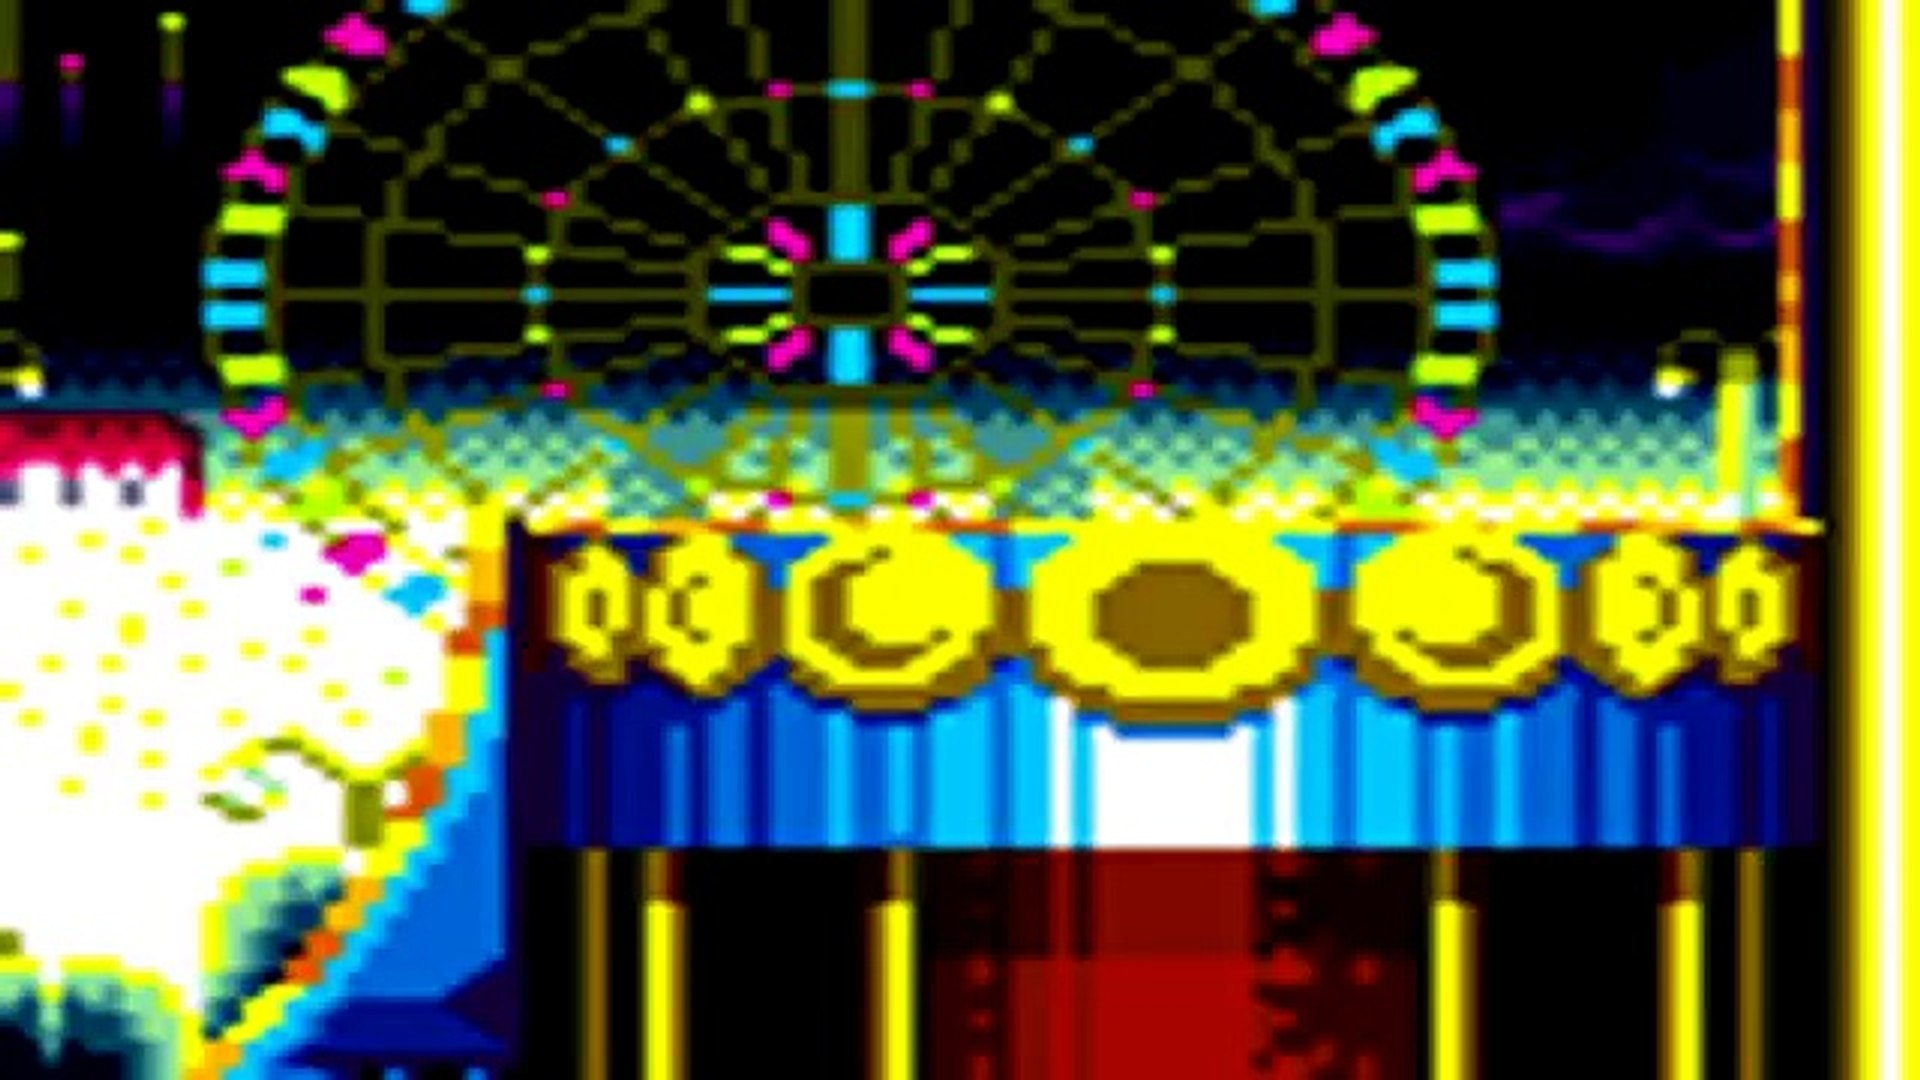 Sonic 3 - Balloon Park Zone (Sonic 2 Remix)